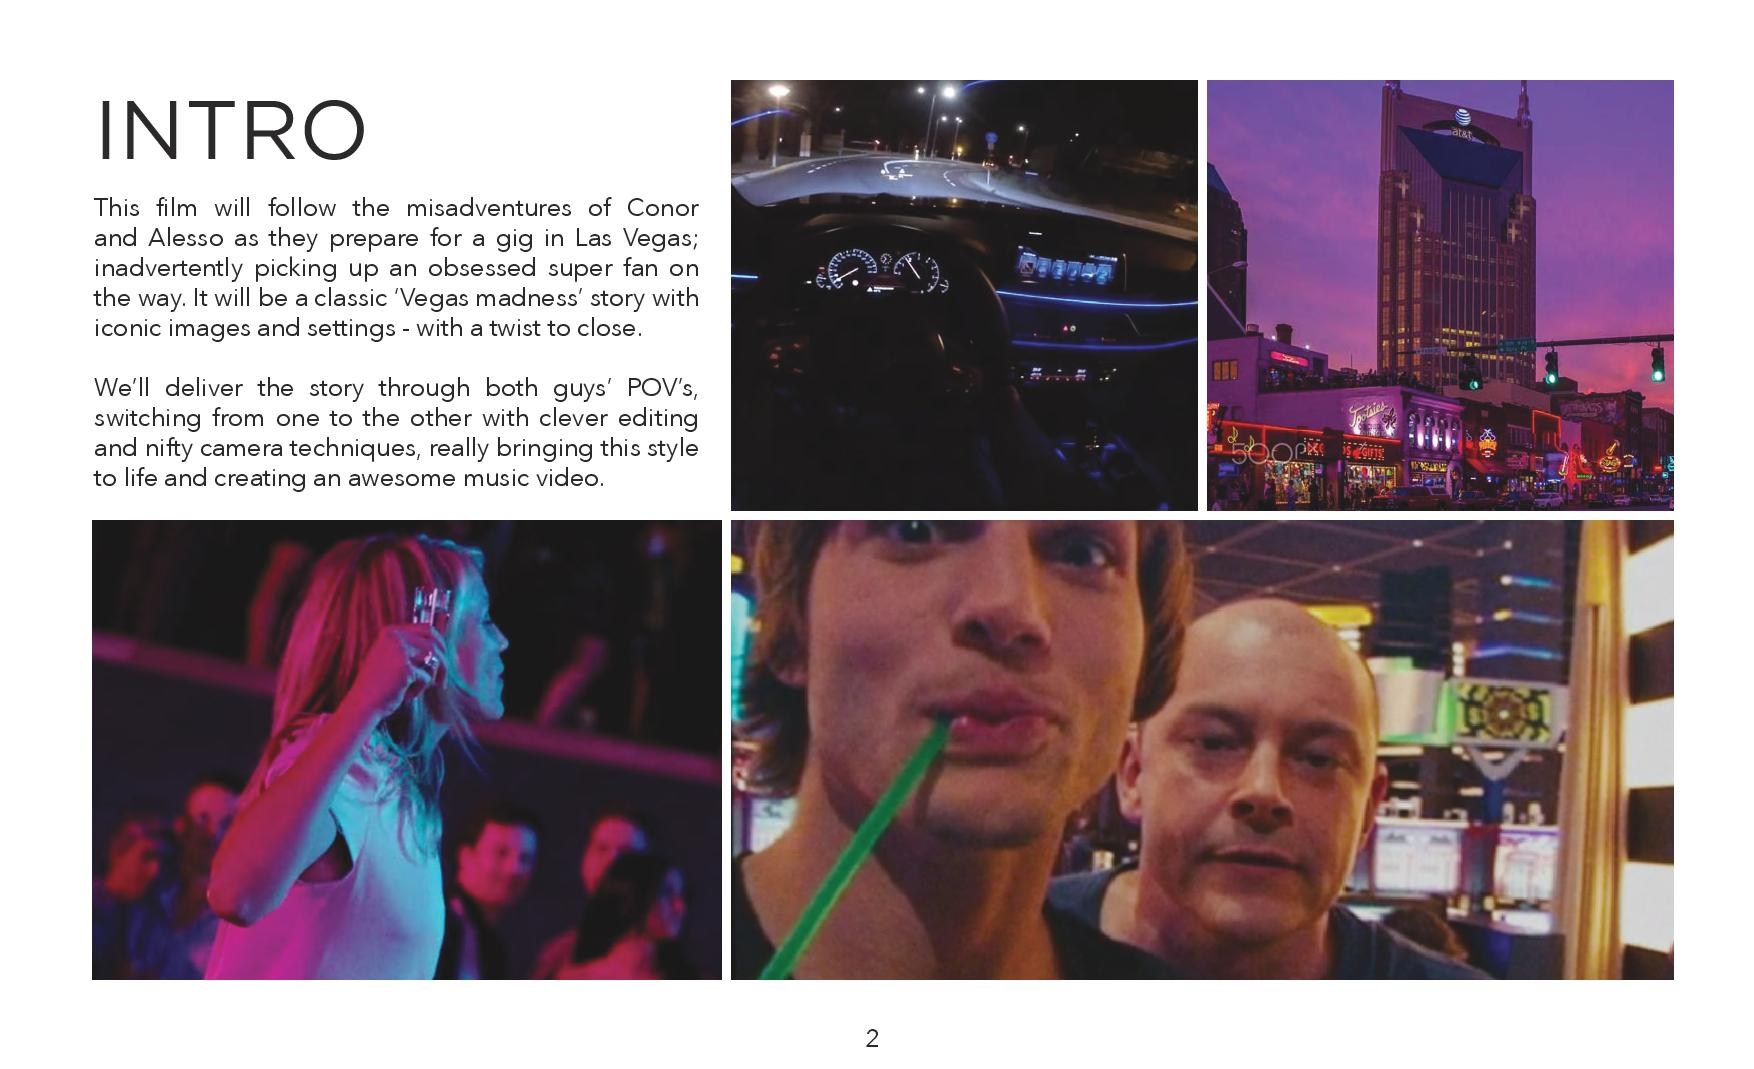 CRAZY-page-002.jpg